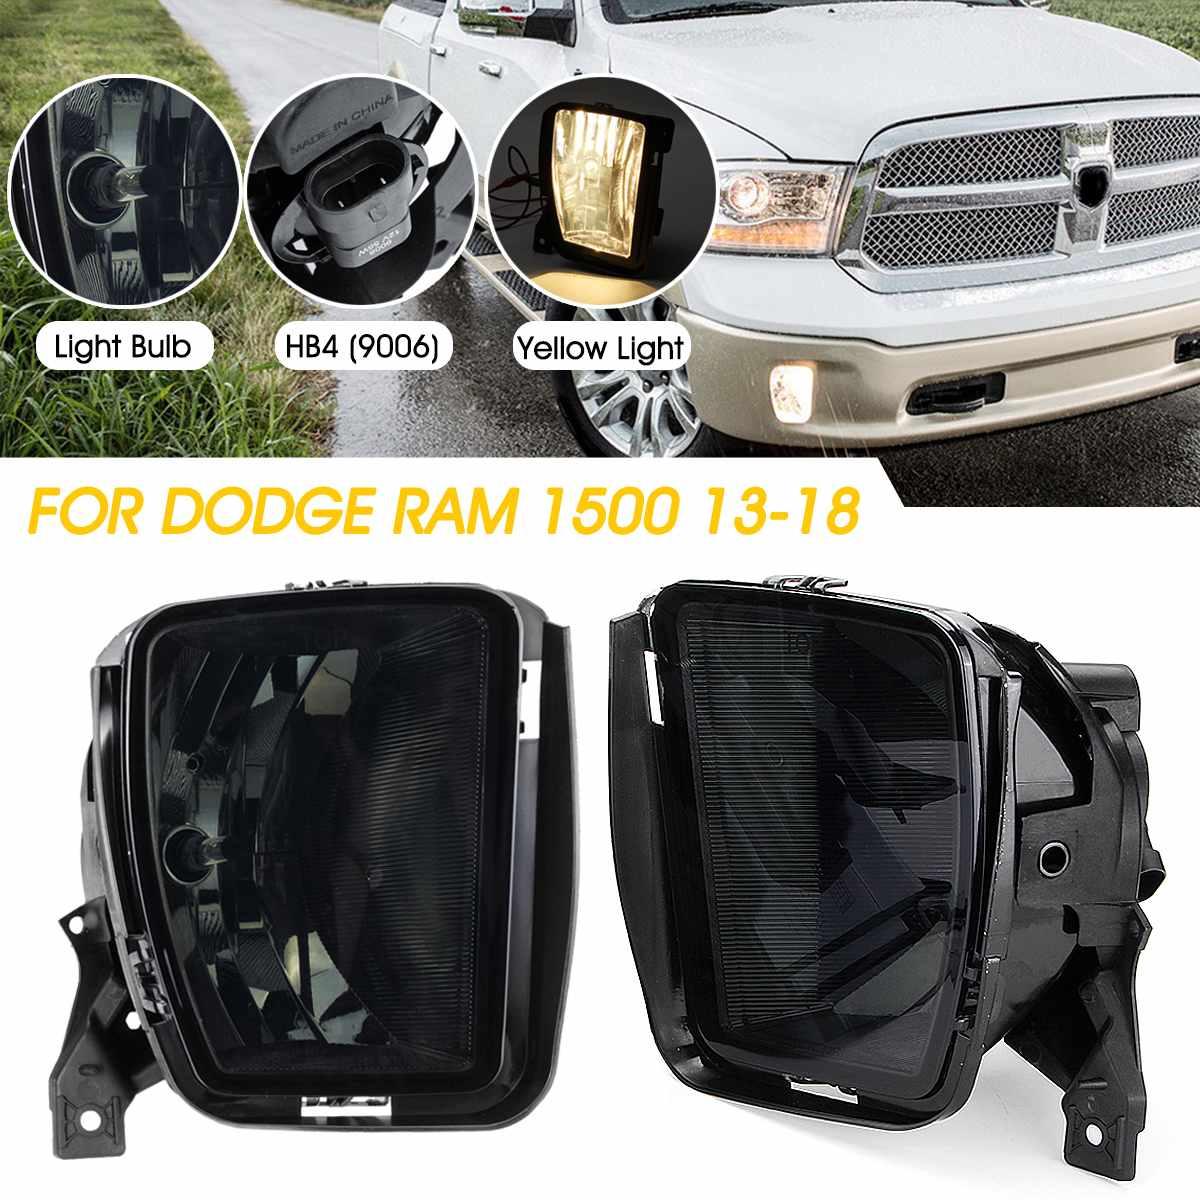 2PCS Car Front Bumper Fog Halogen Lights Fog Light With Bulbs For Dodge RAM 1500 2013 2014 2015 2016 2017 2018